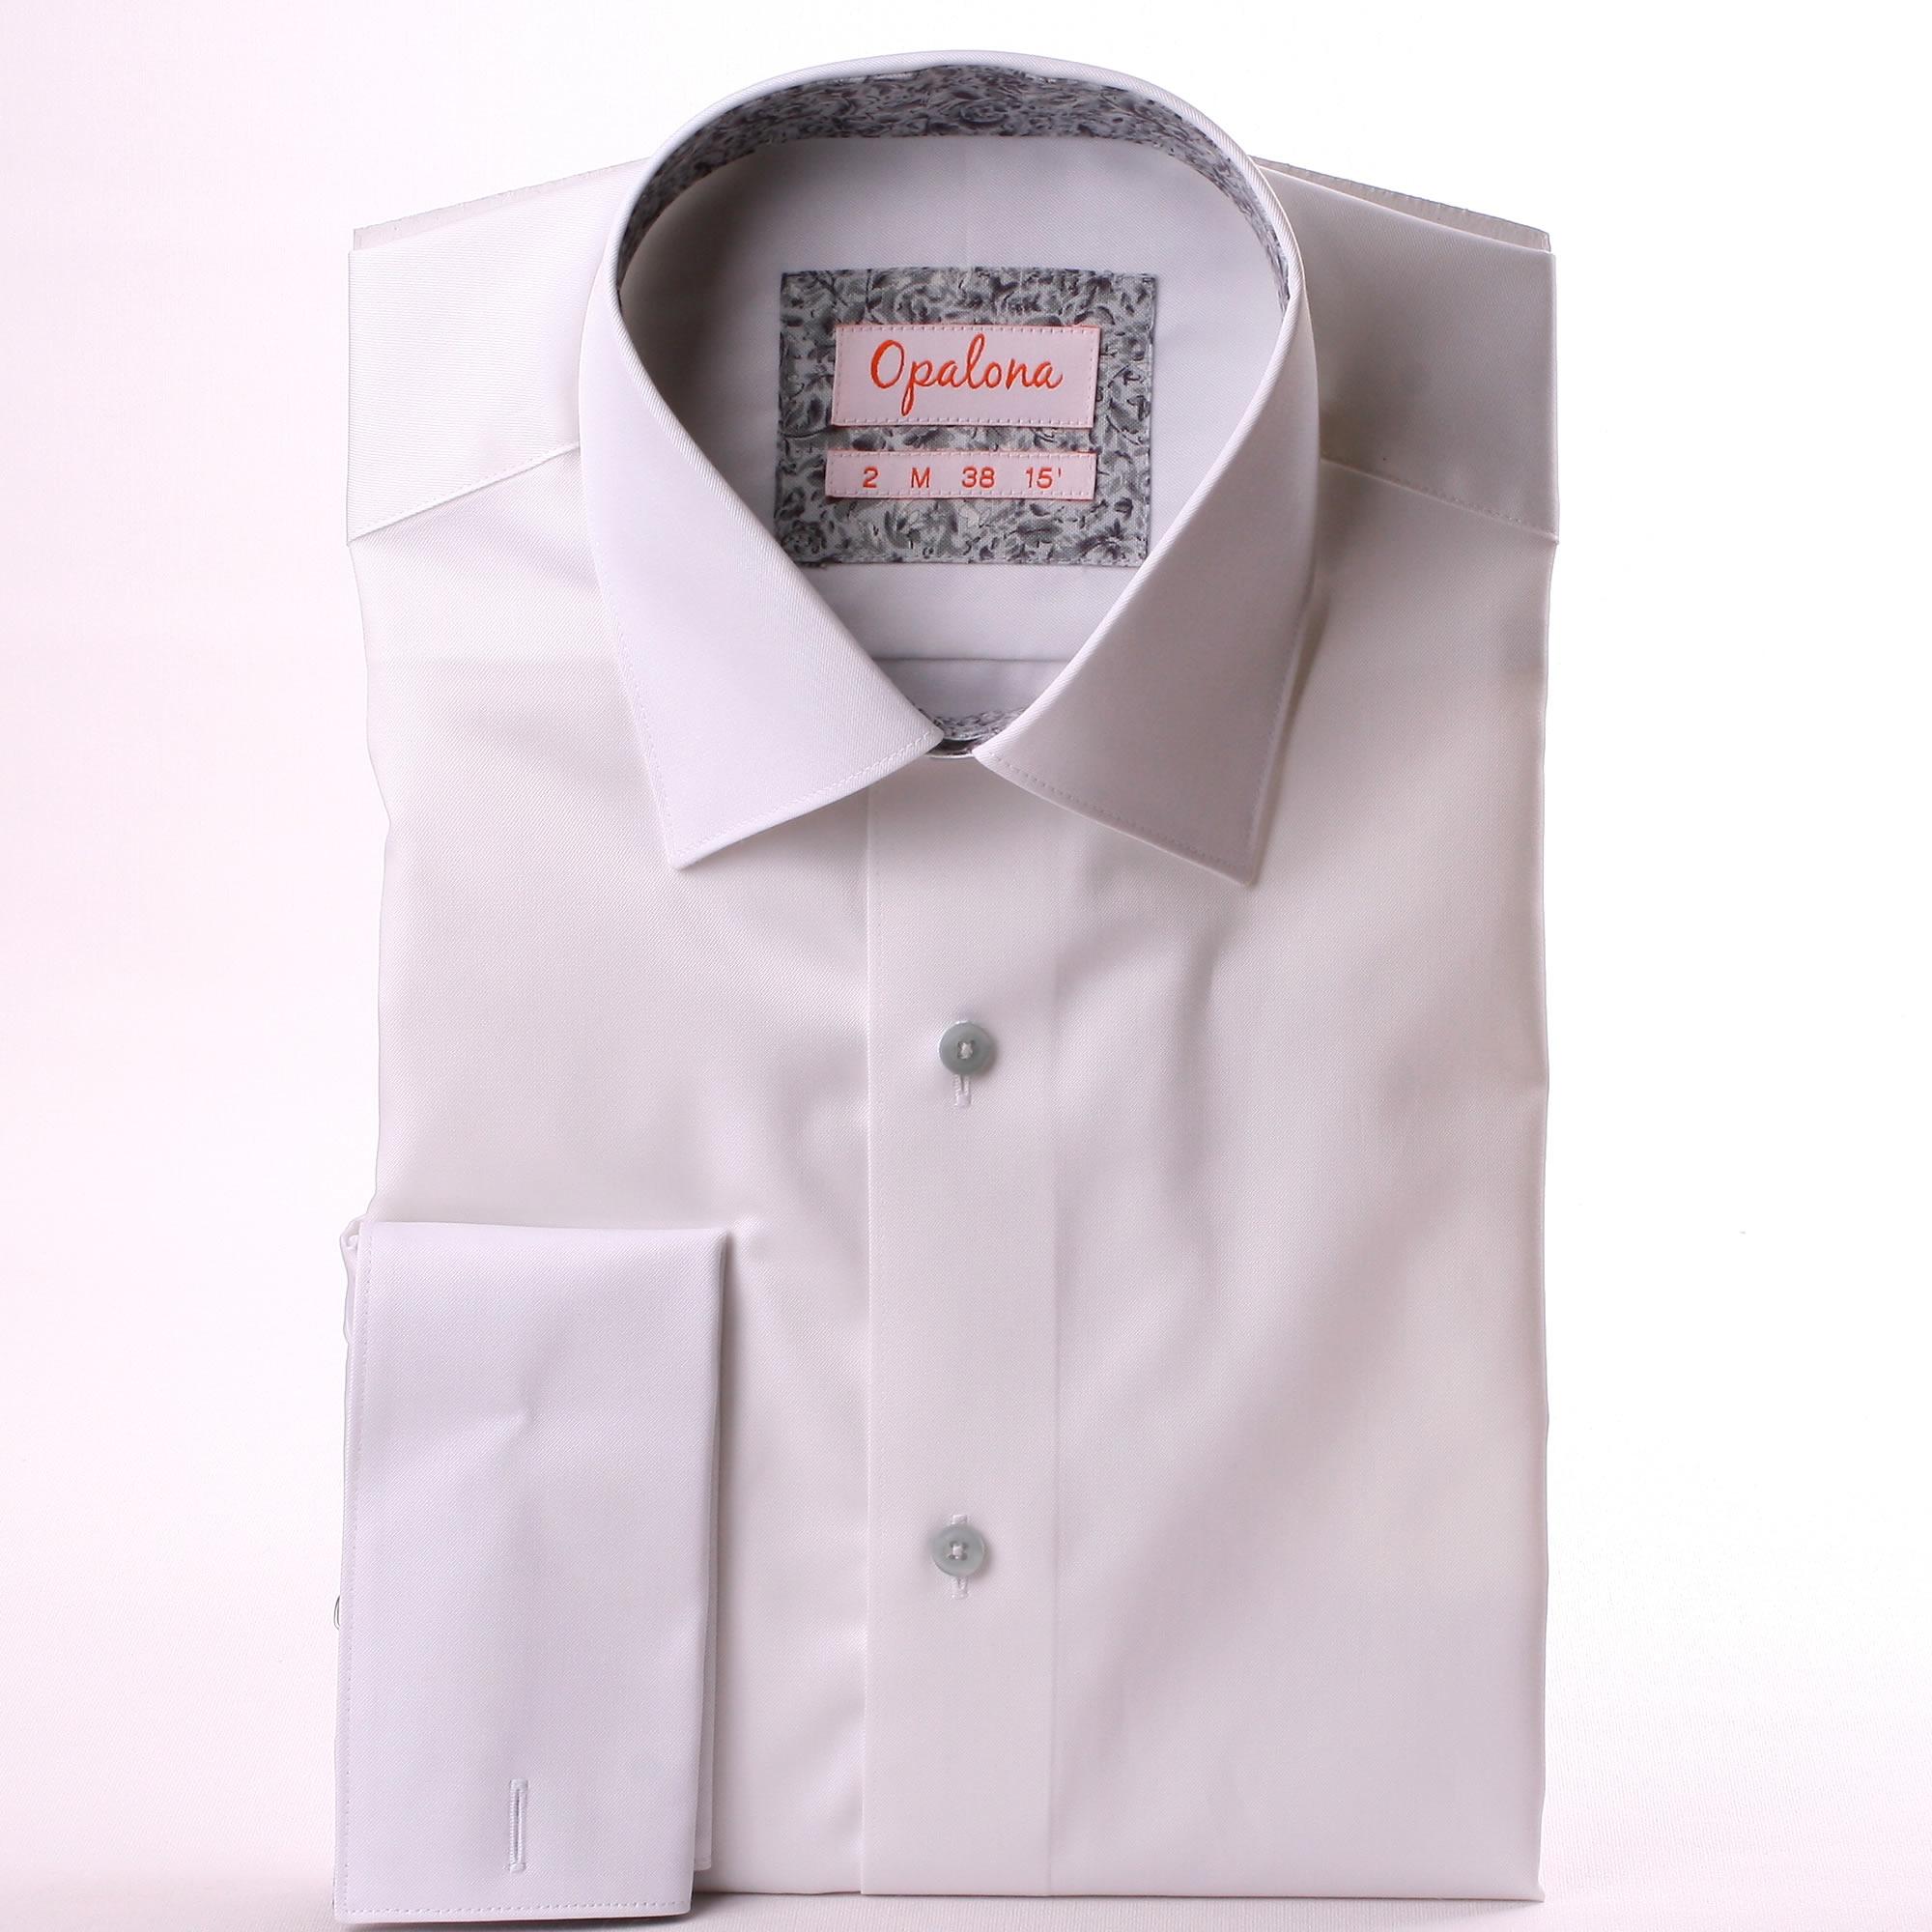 White french cuff shirt with grey pattern collar and cuffs French cuff shirt women